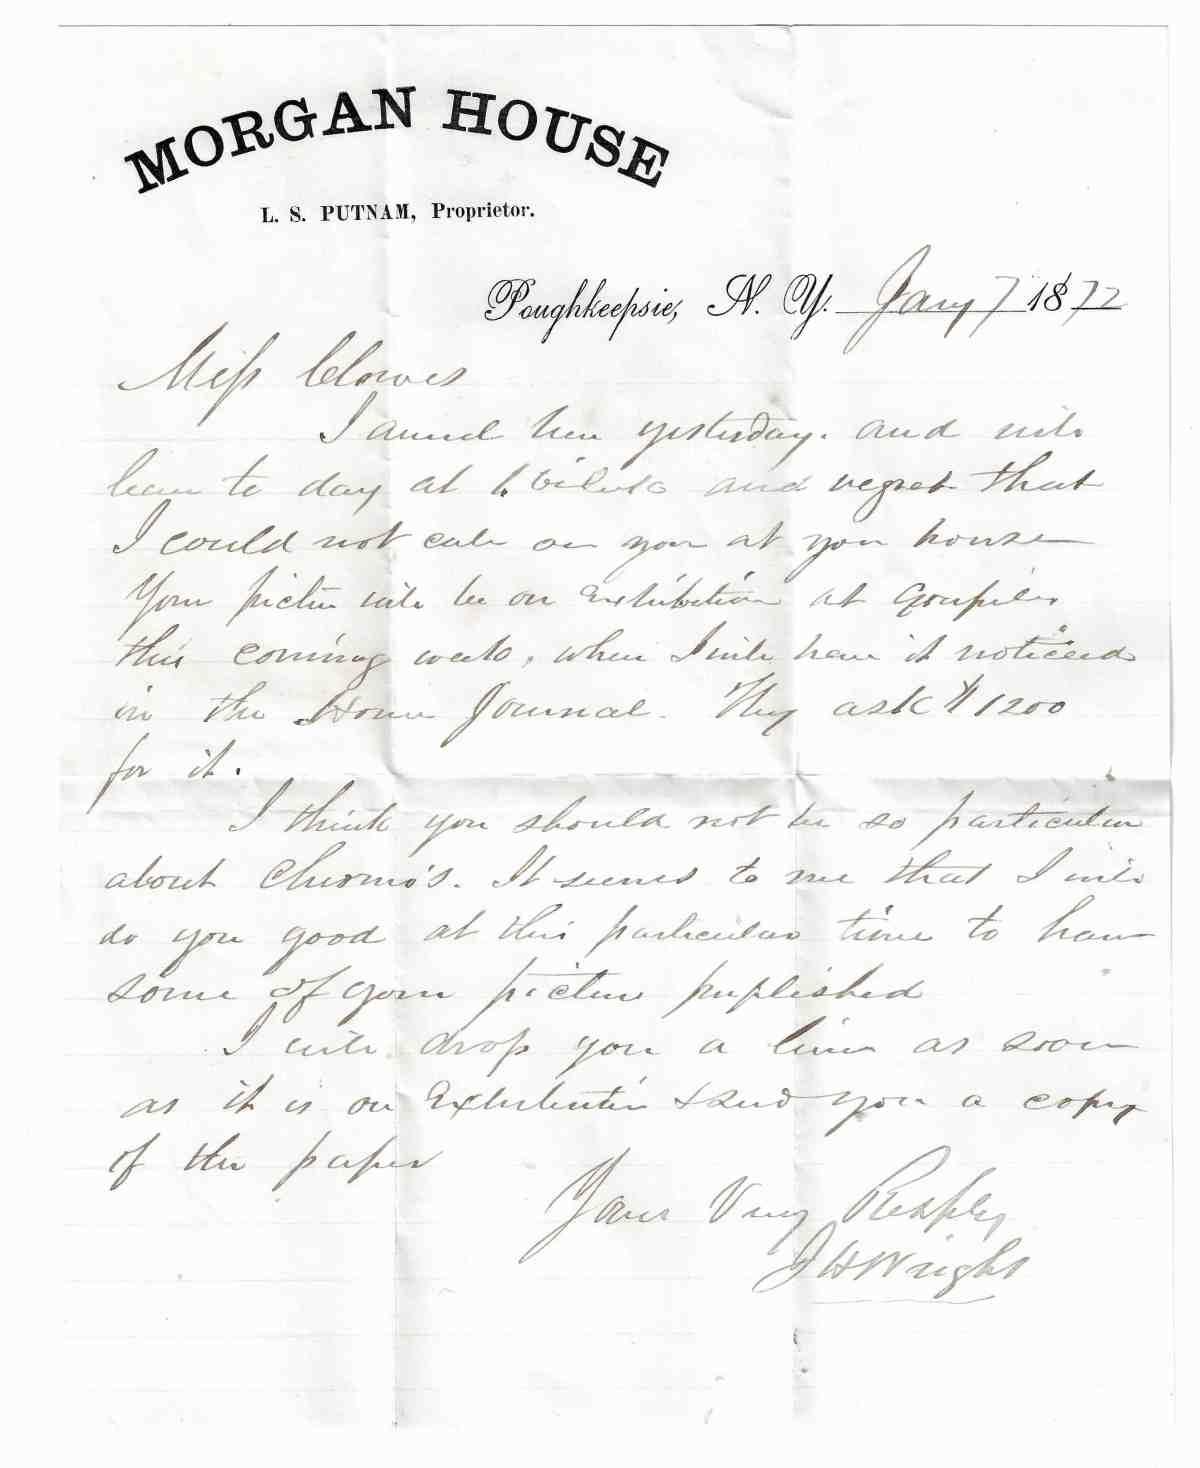 CMCE J H Wright 1872 JAN 07